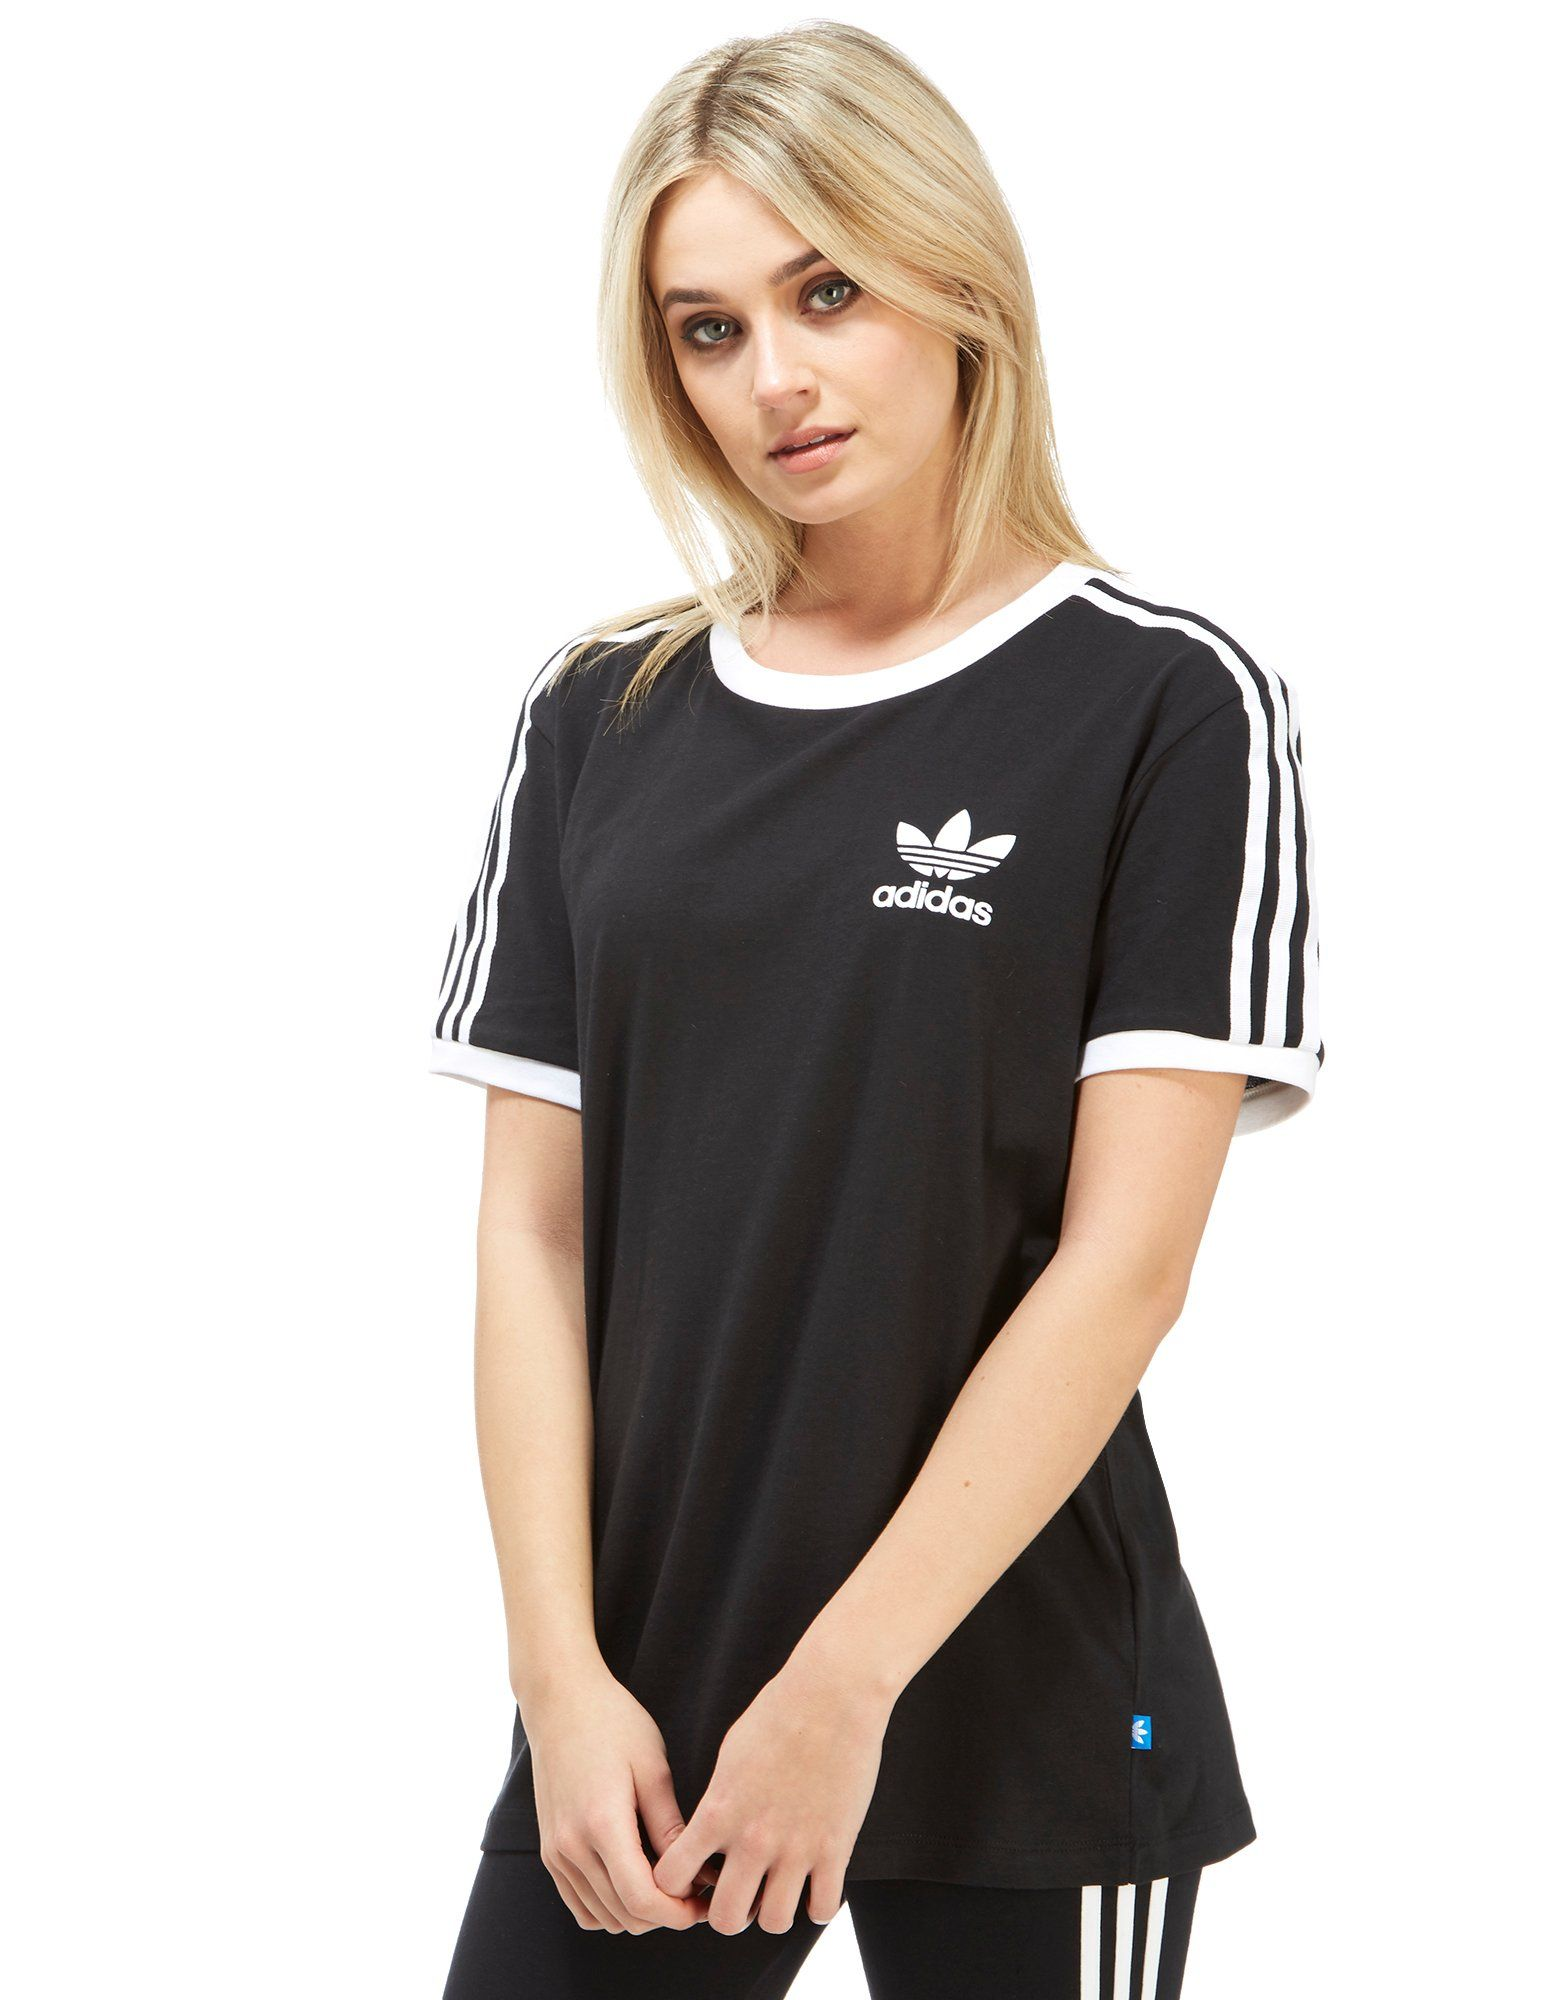 All'adidas Originali California T - Shirt Jd Sports